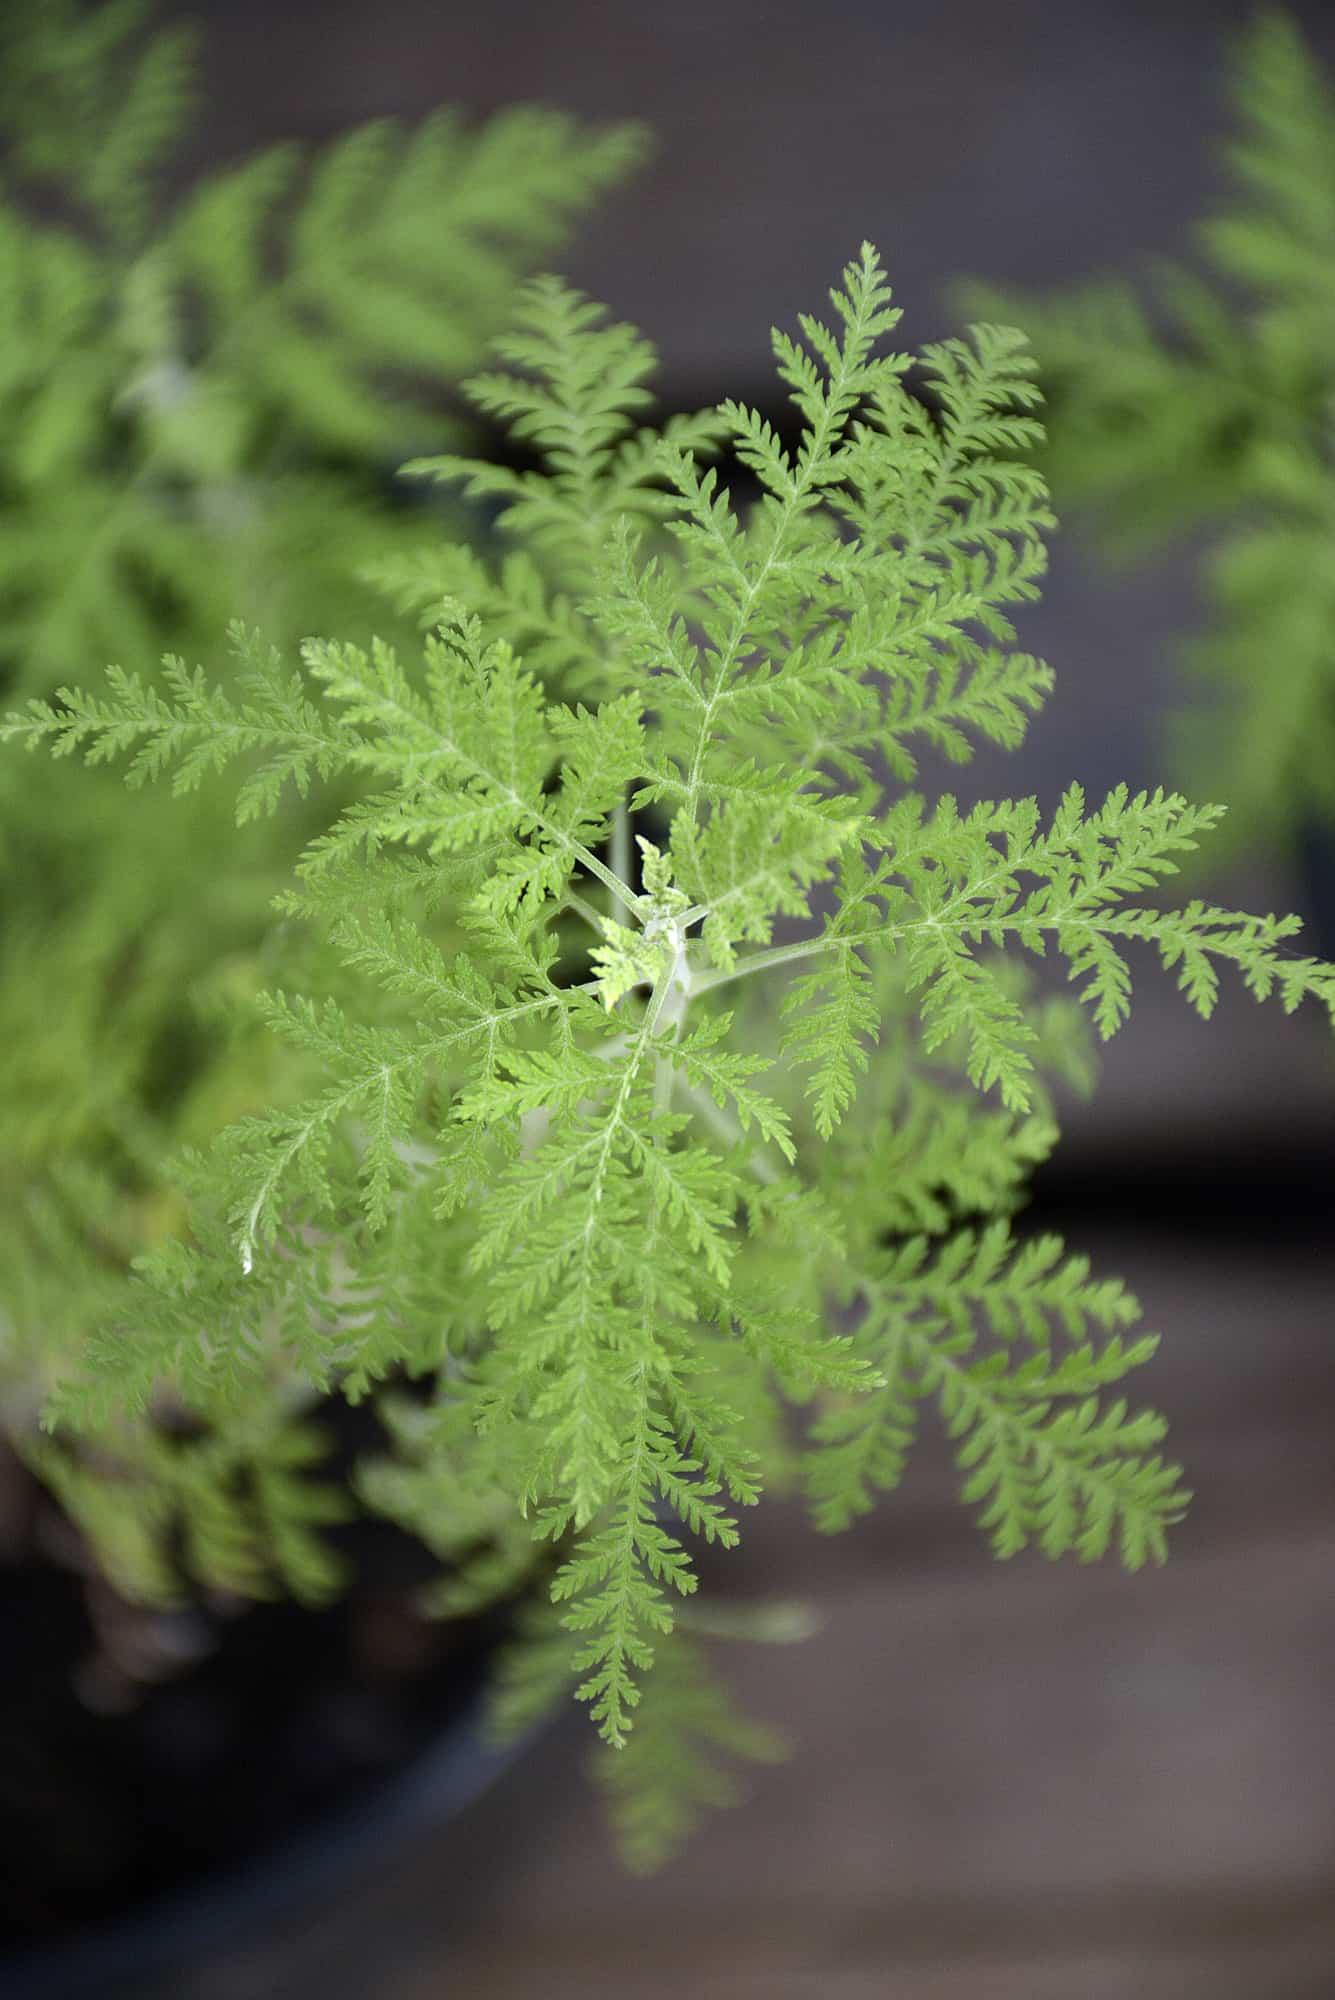 artemisia afra wilde als african wormwood herbs medicine medicinal lifestyle home garden nursery plant shop johannesburg gauteng